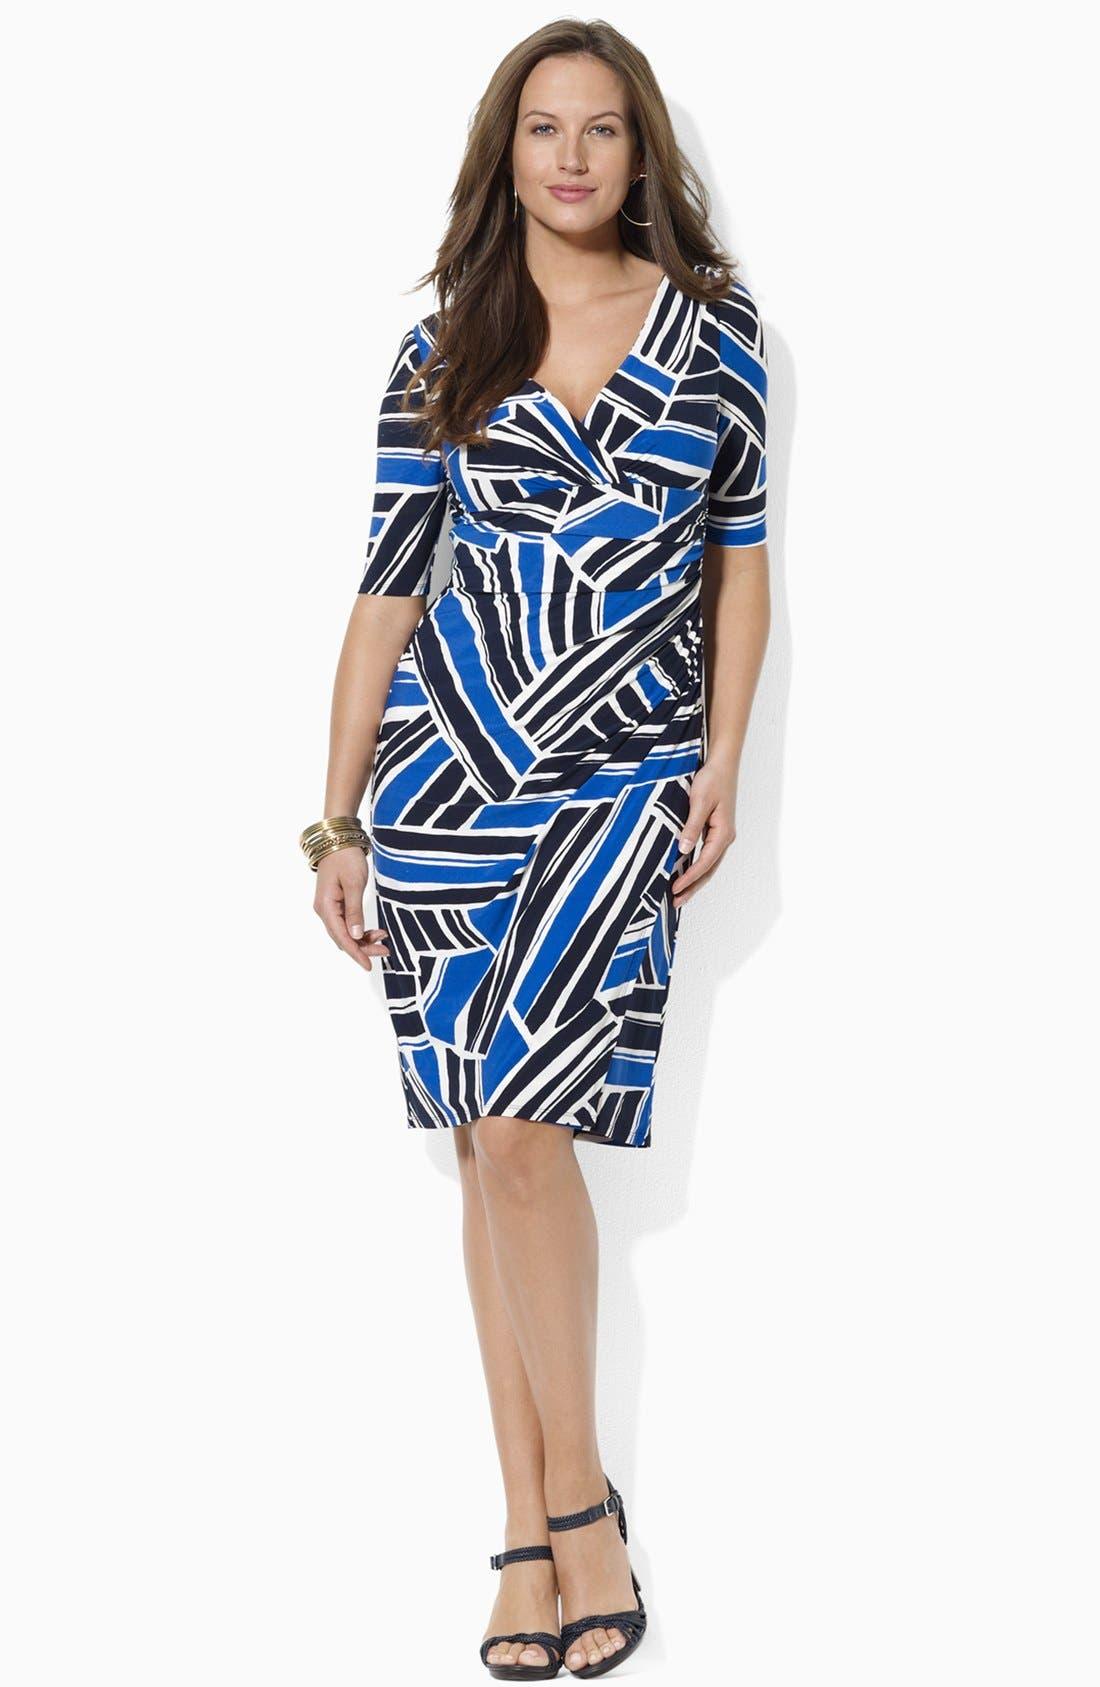 Alternate Image 1 Selected - Lauren Ralph Lauren Print Jersey Sheath Dress (Plus Size)